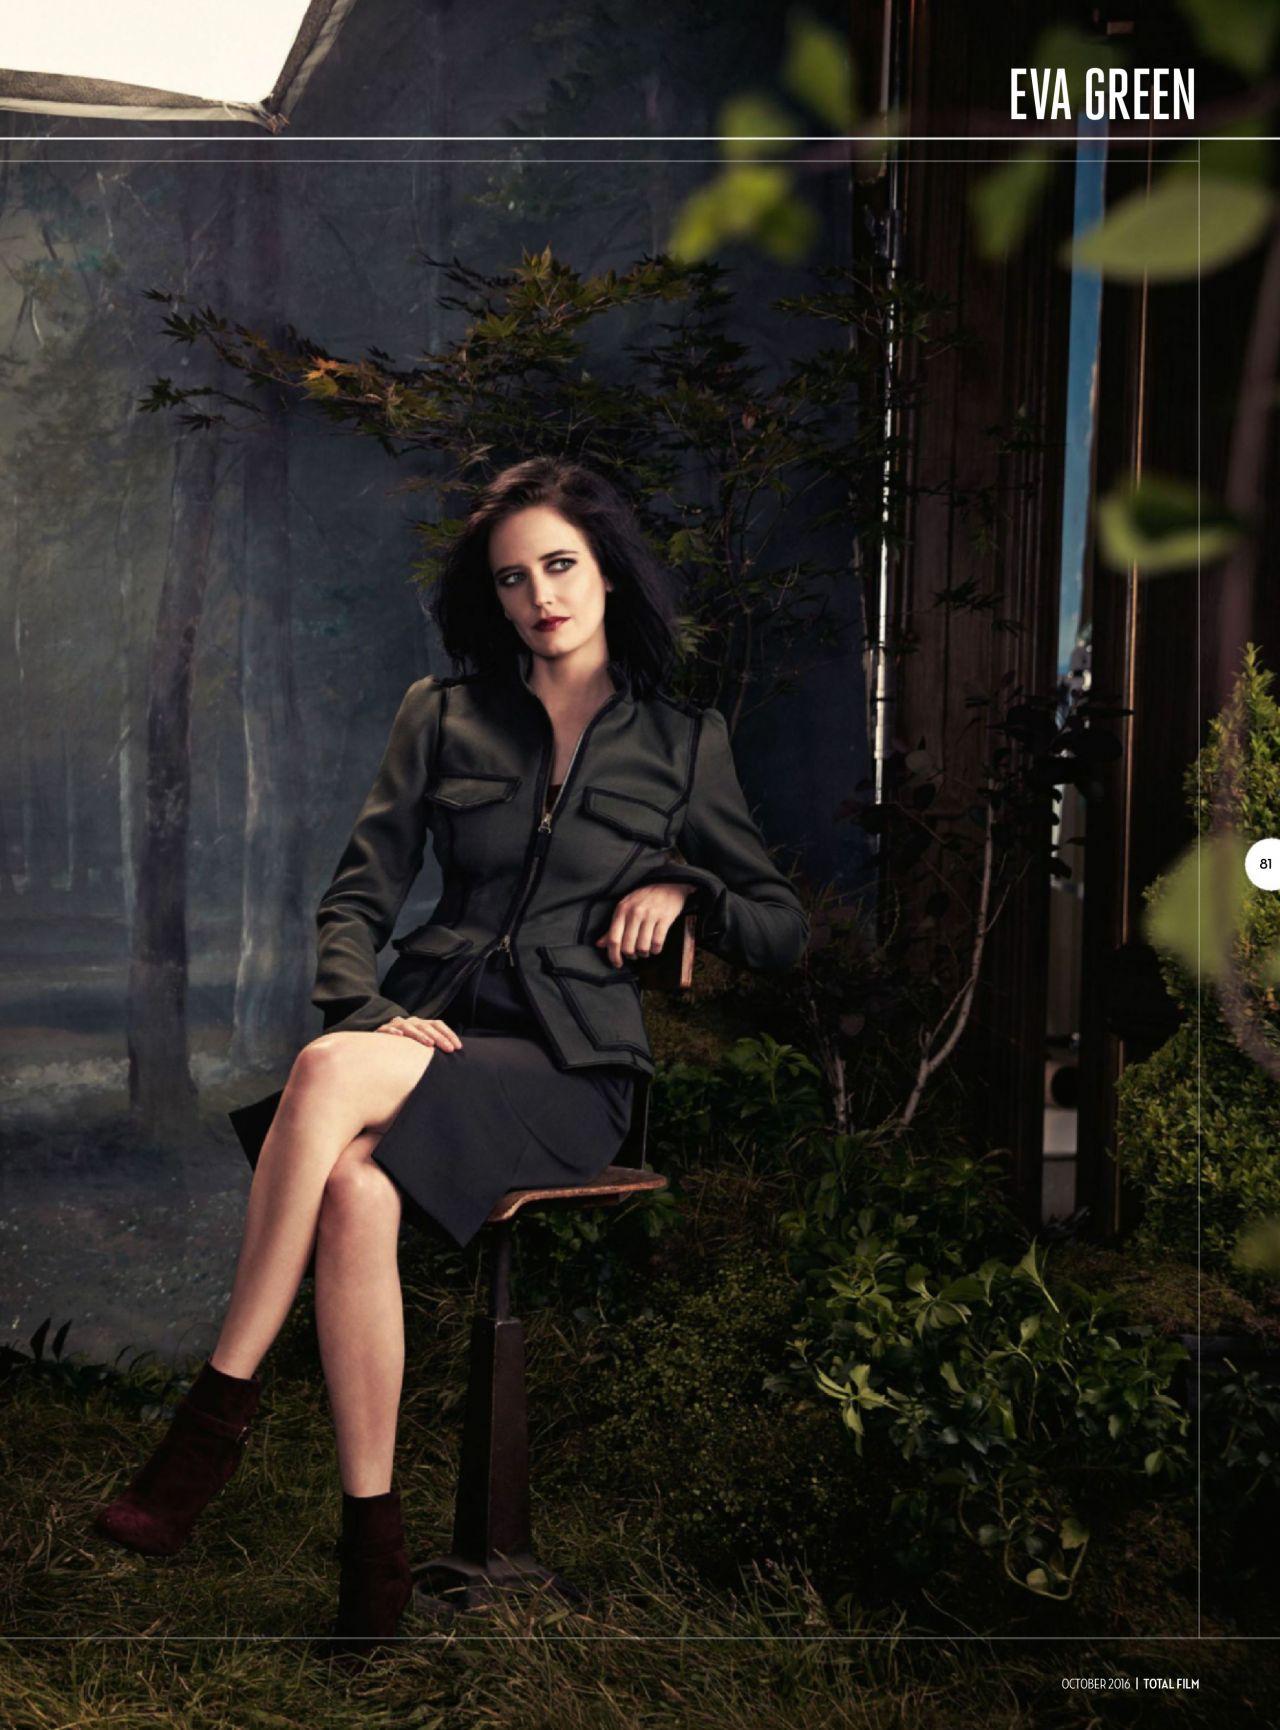 Eva Green Latest Photos - CelebMafia Eva Green